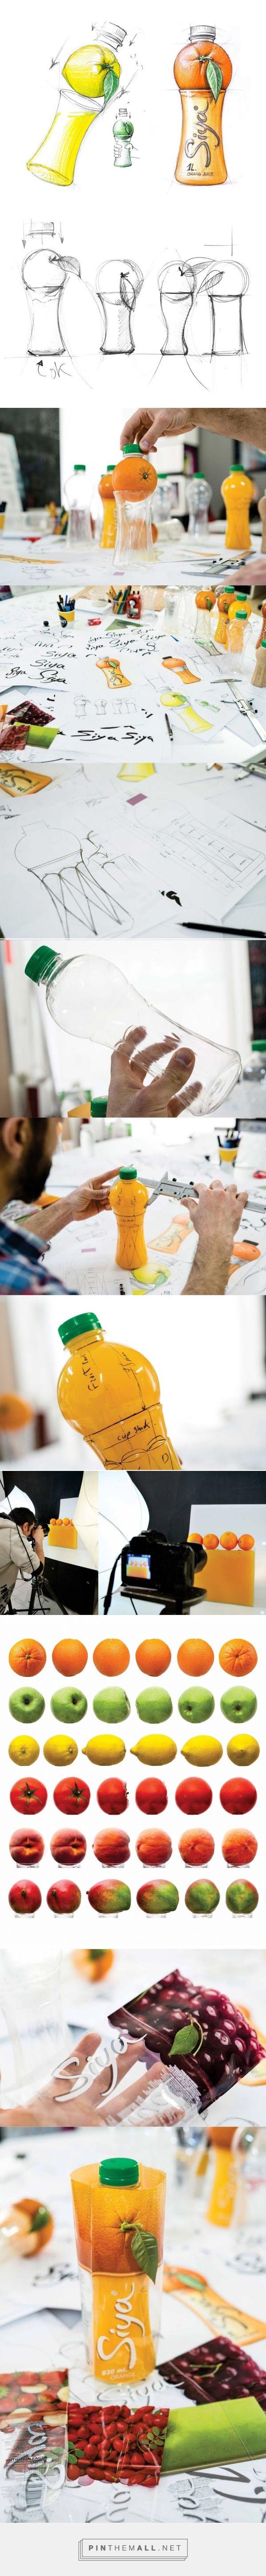 Siya Juice Packaging Development by Backbone Branding